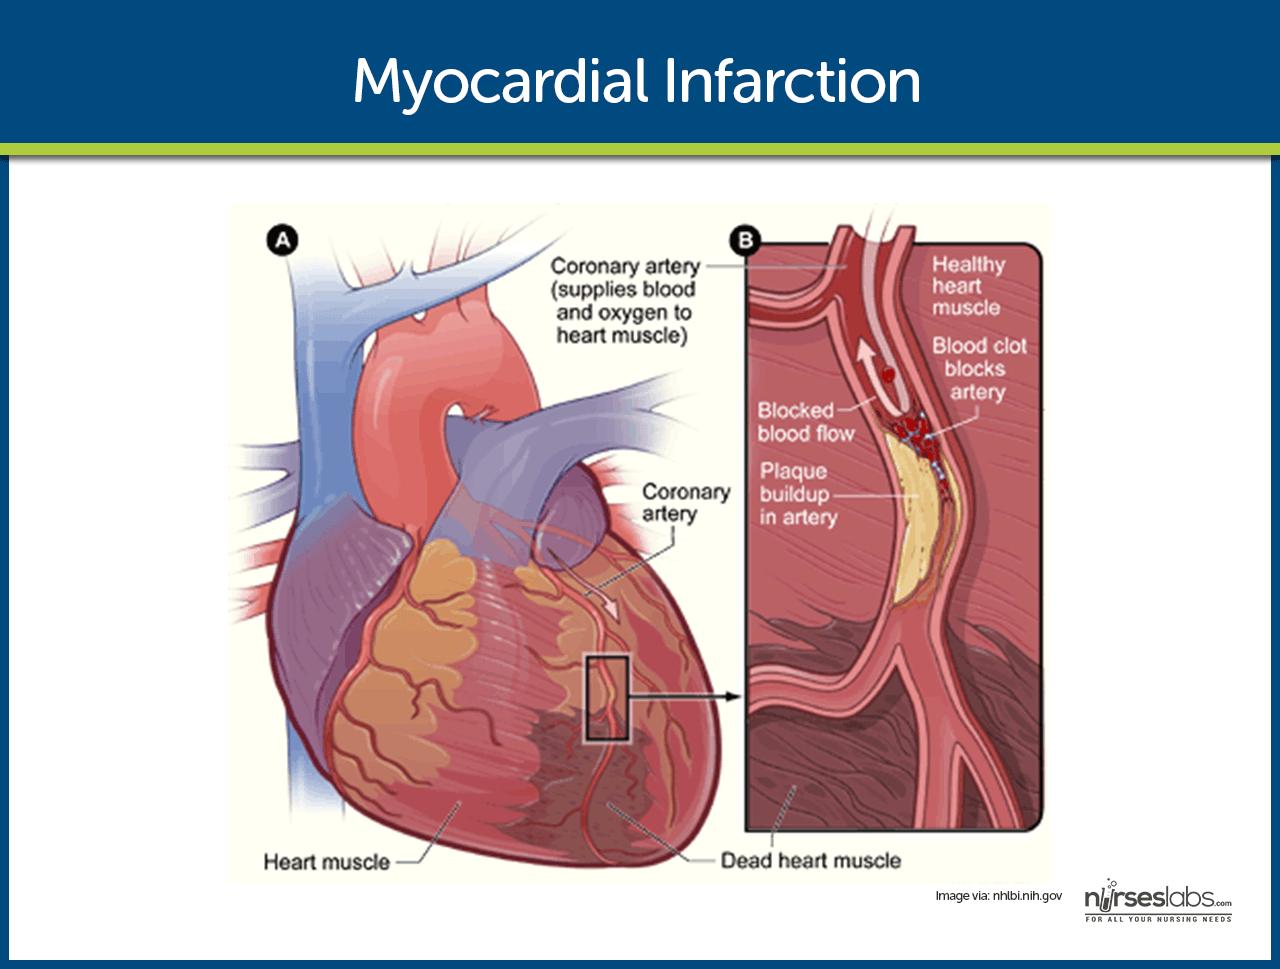 Myocardium diagram craftbrewswagfo myocardial infarction nursing care management and study guide muscles ccuart Choice Image